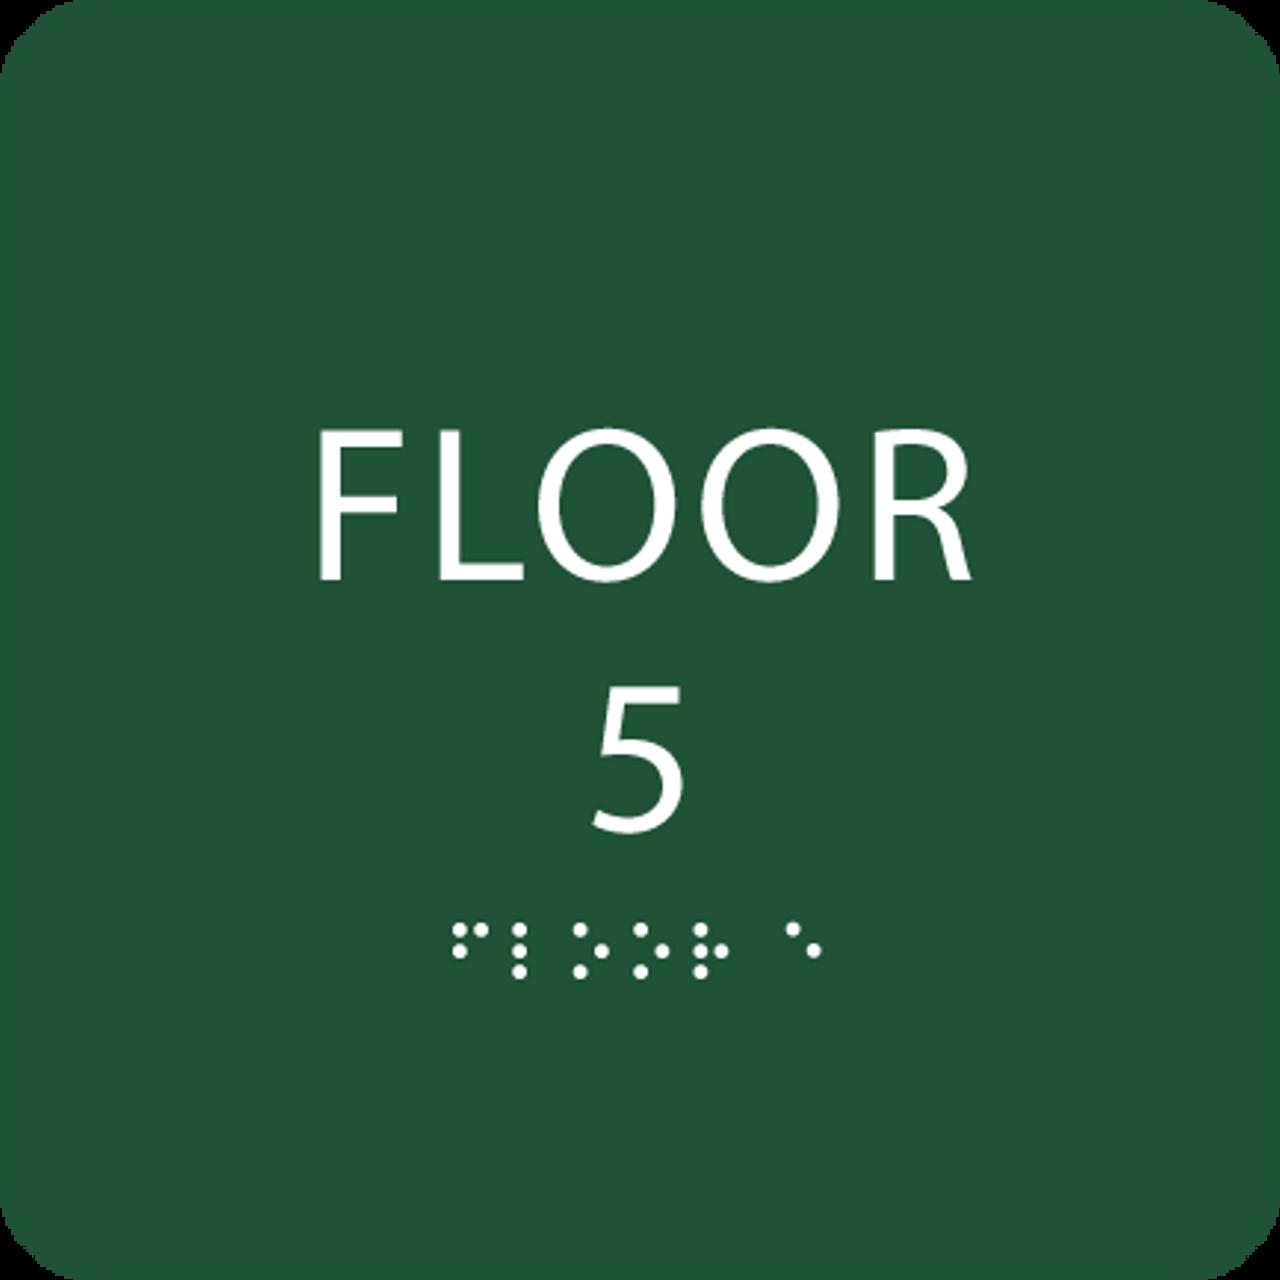 Green Floor 5 Number Identification Sign